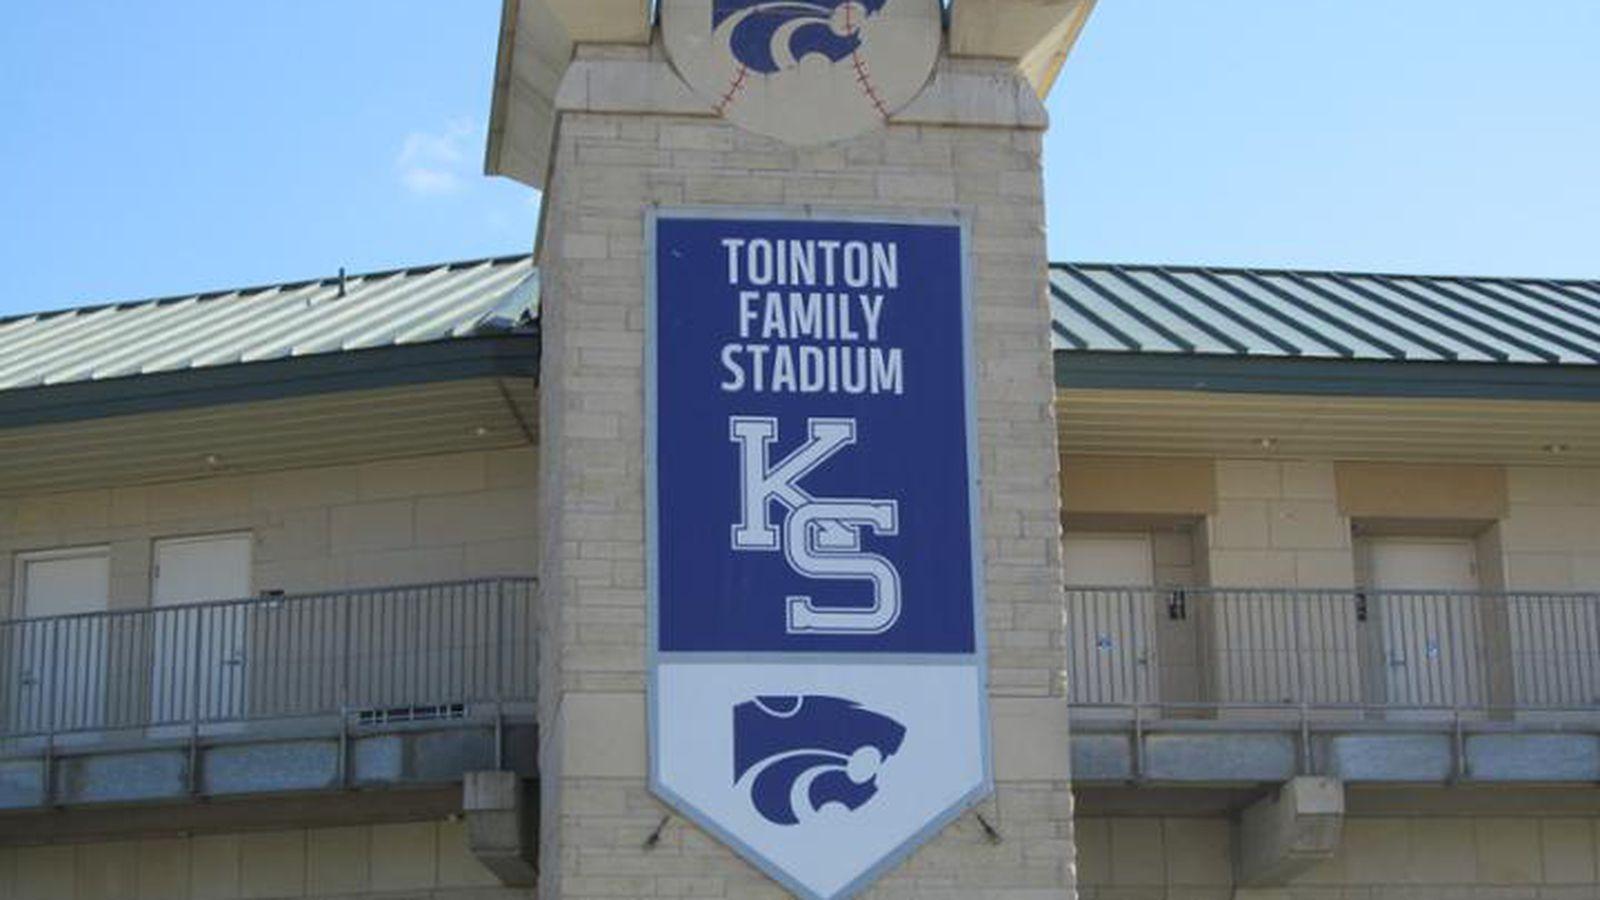 2311_tointon_family_stadium_exterior.0